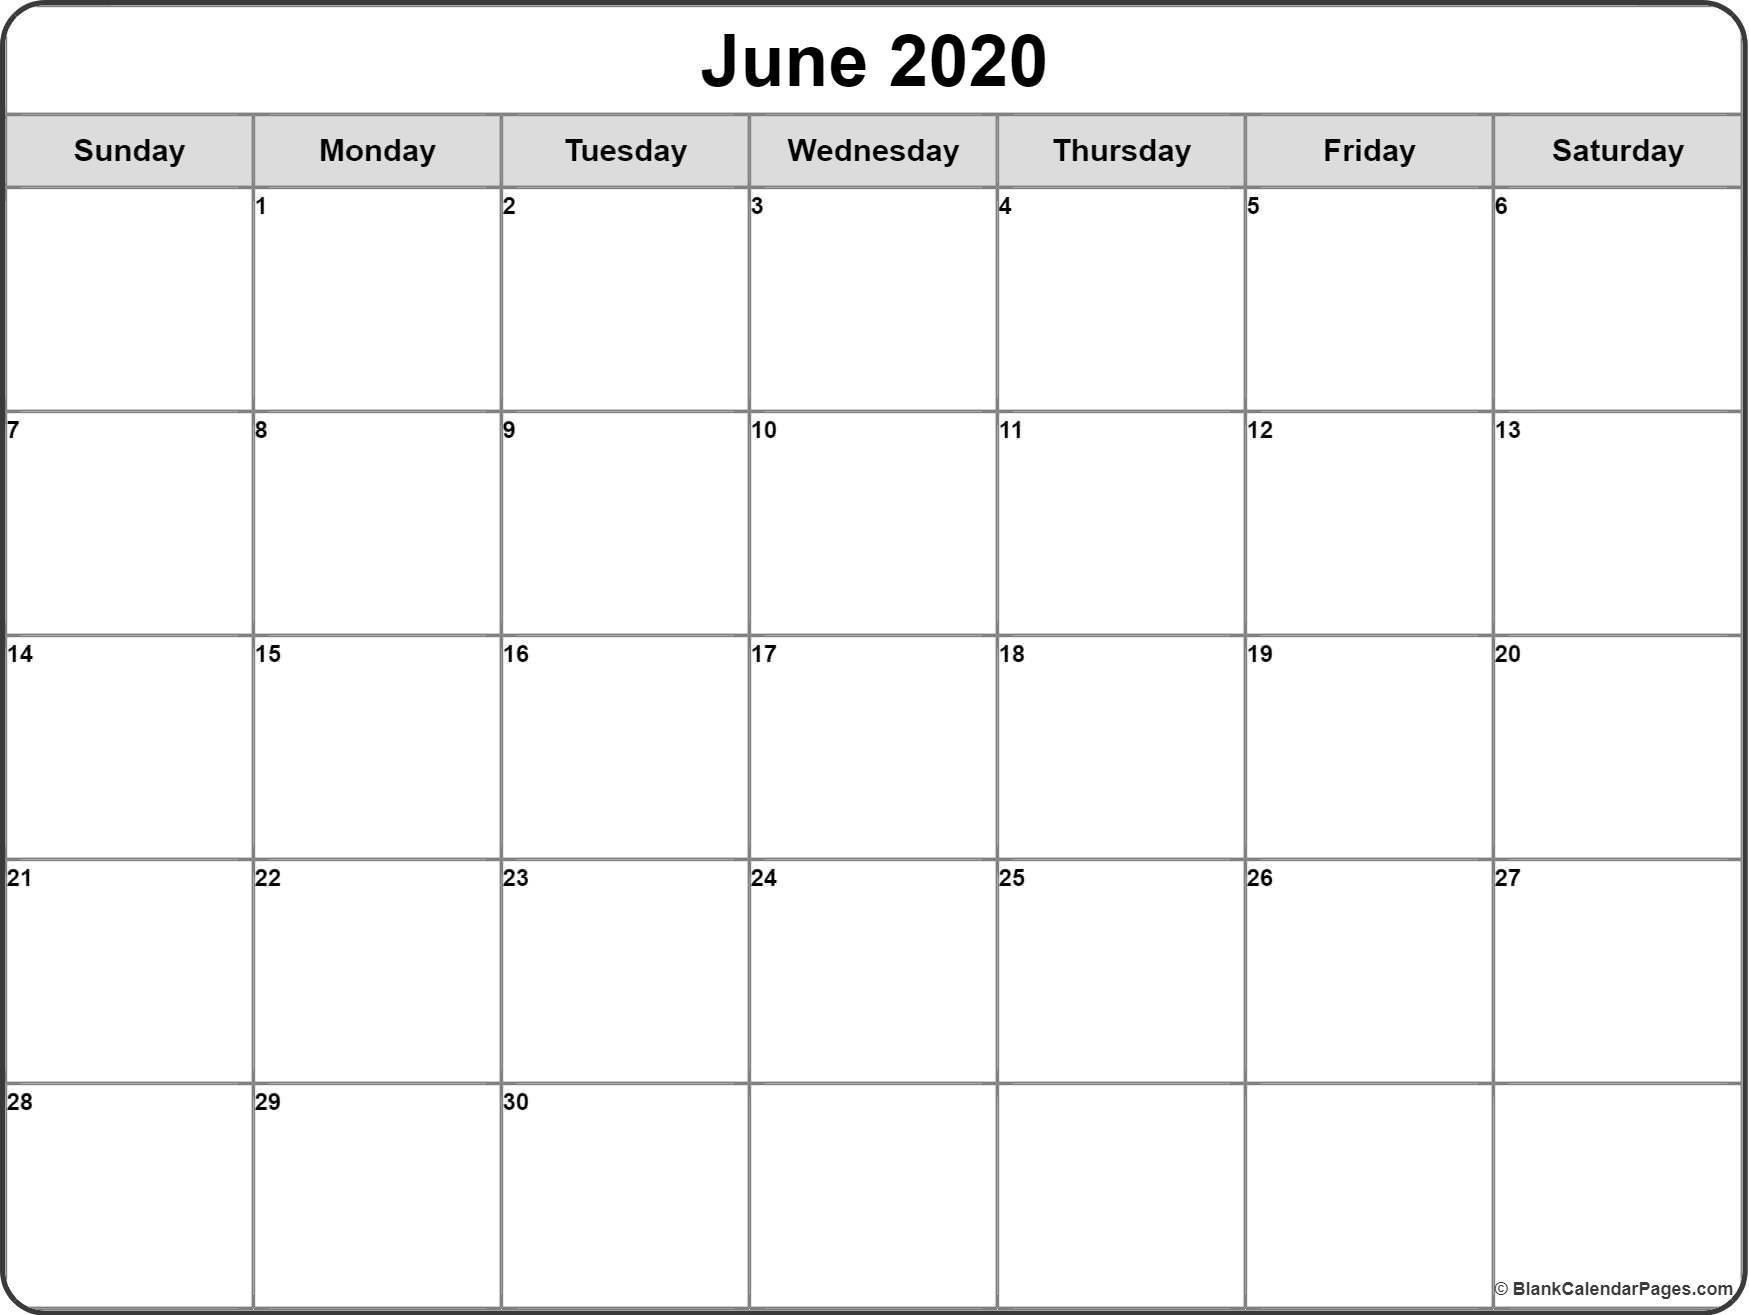 June 2020 Calendar | Free Printable Monthly Calendars-Fill In Monthly Calendar 2020